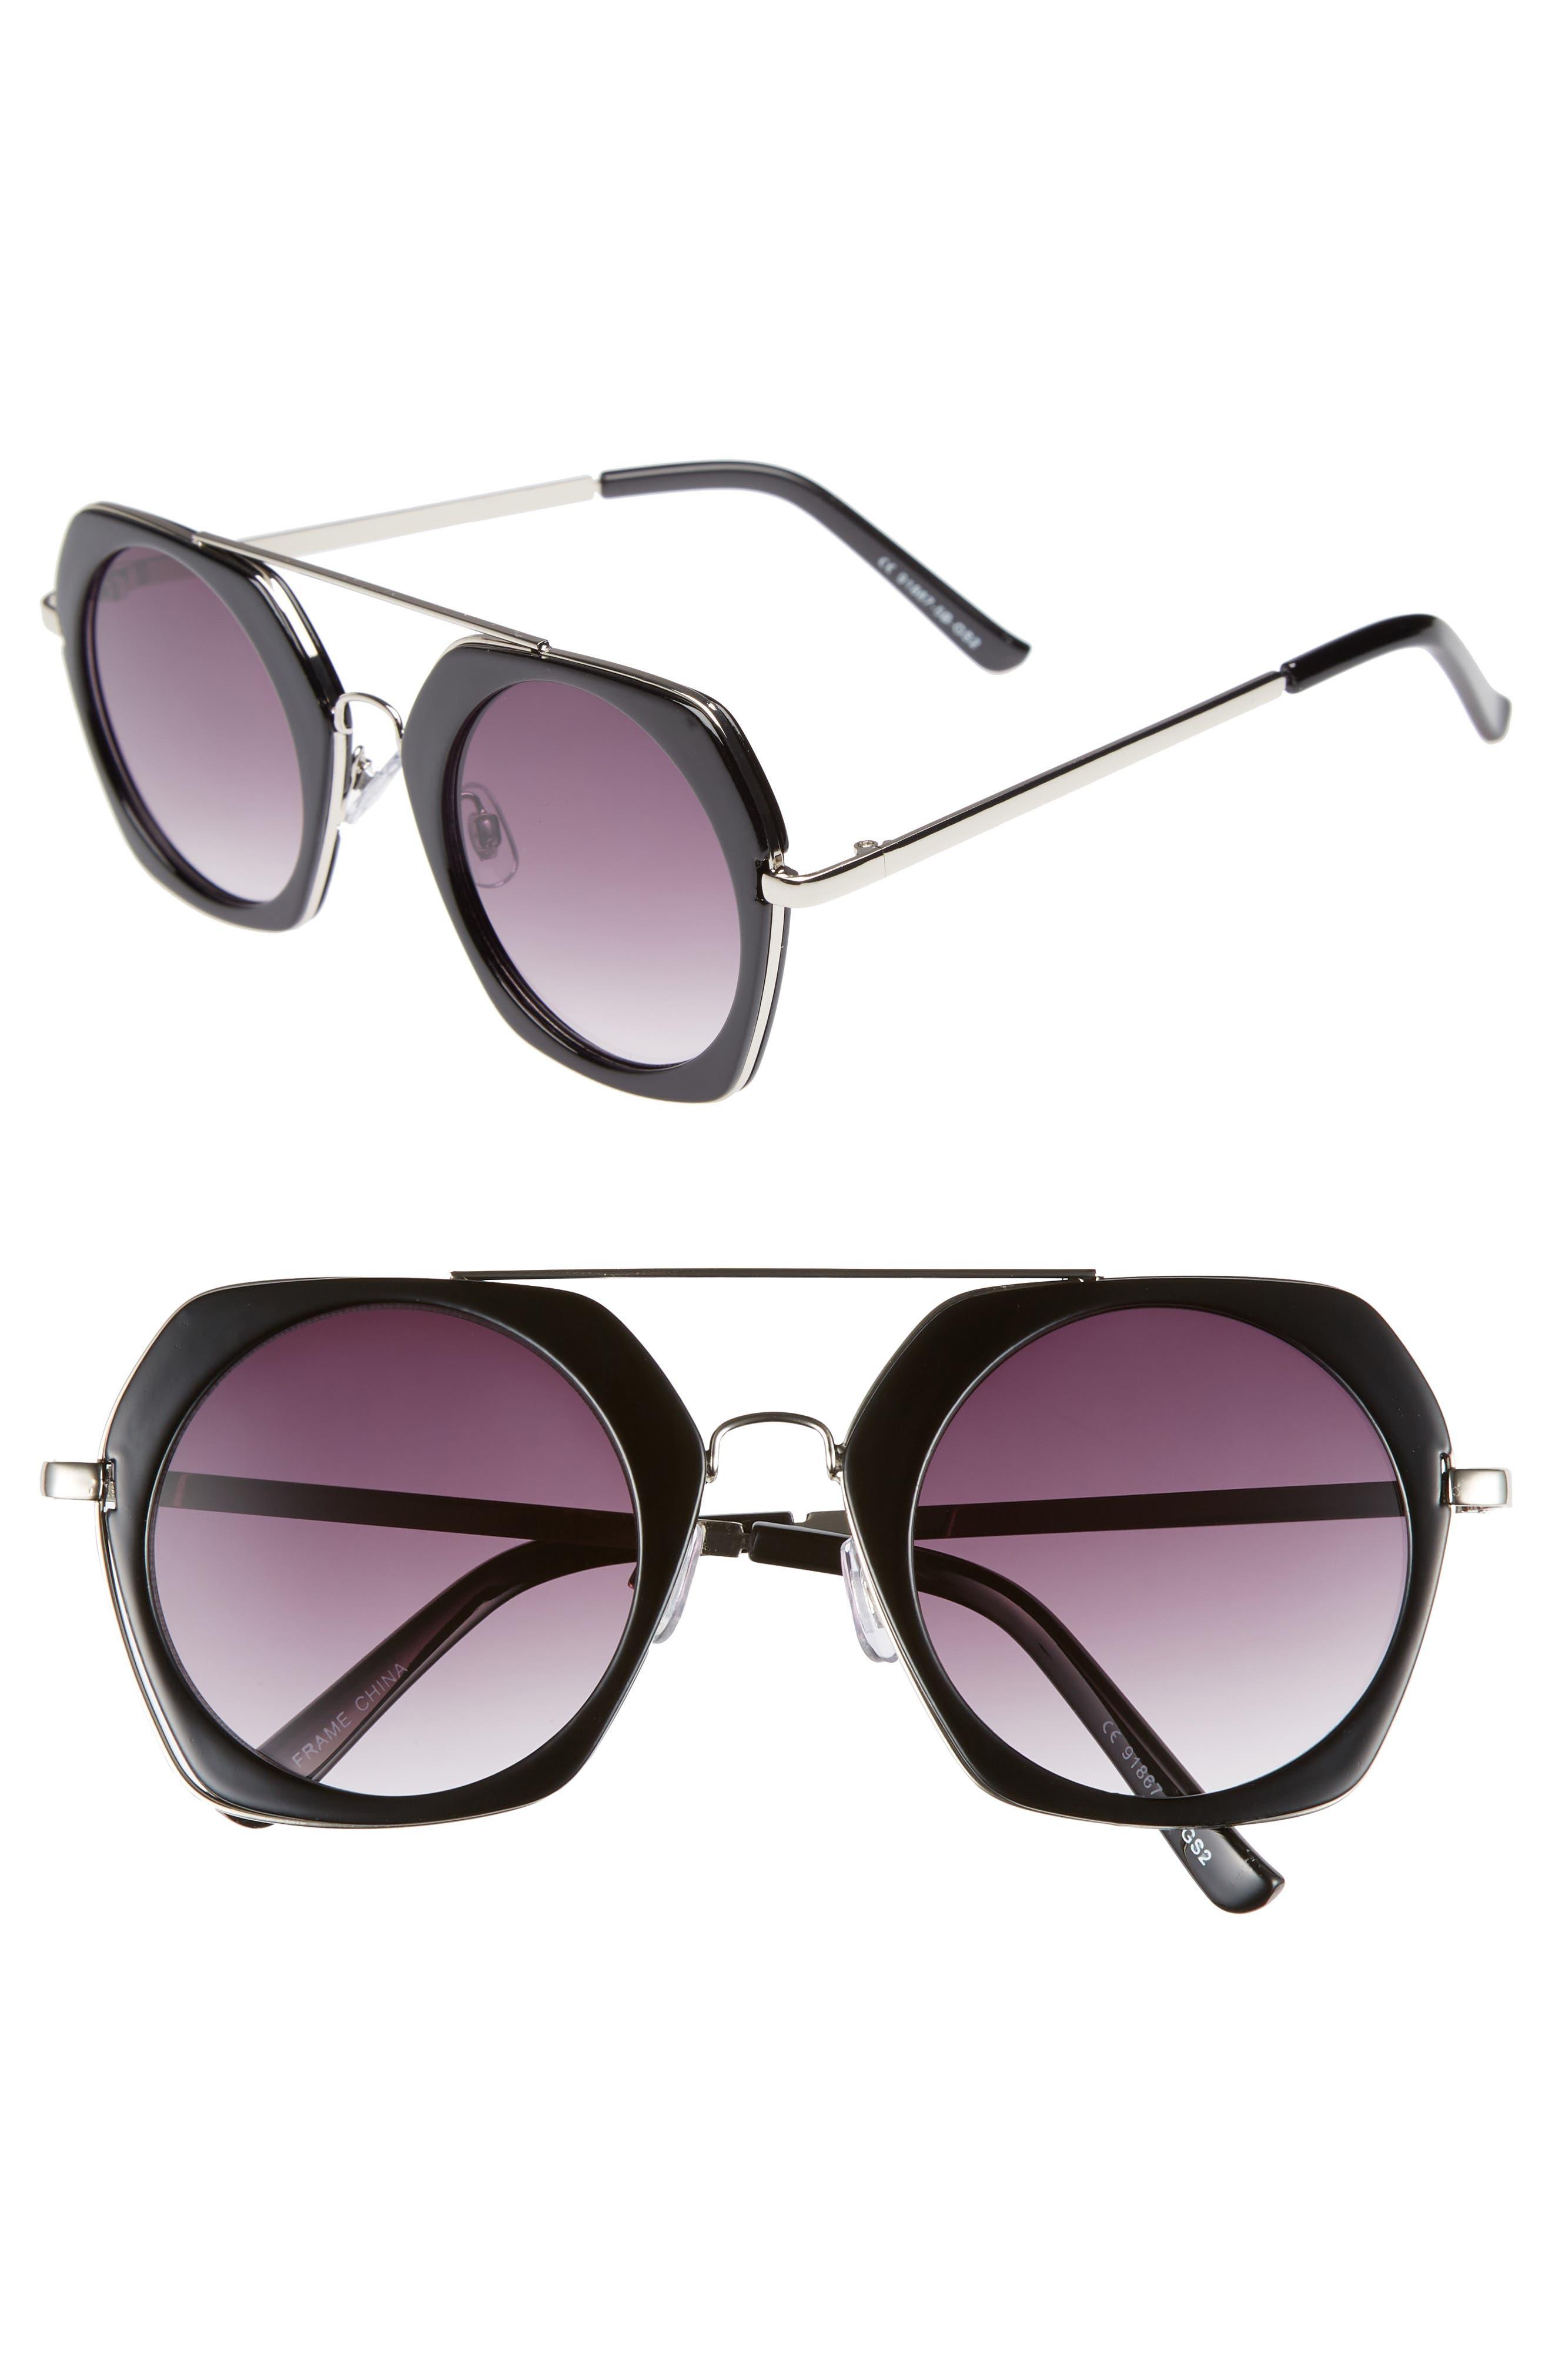 50mm Geometric Aviator Sunglasses,                             Main thumbnail 1, color,                             BLACK